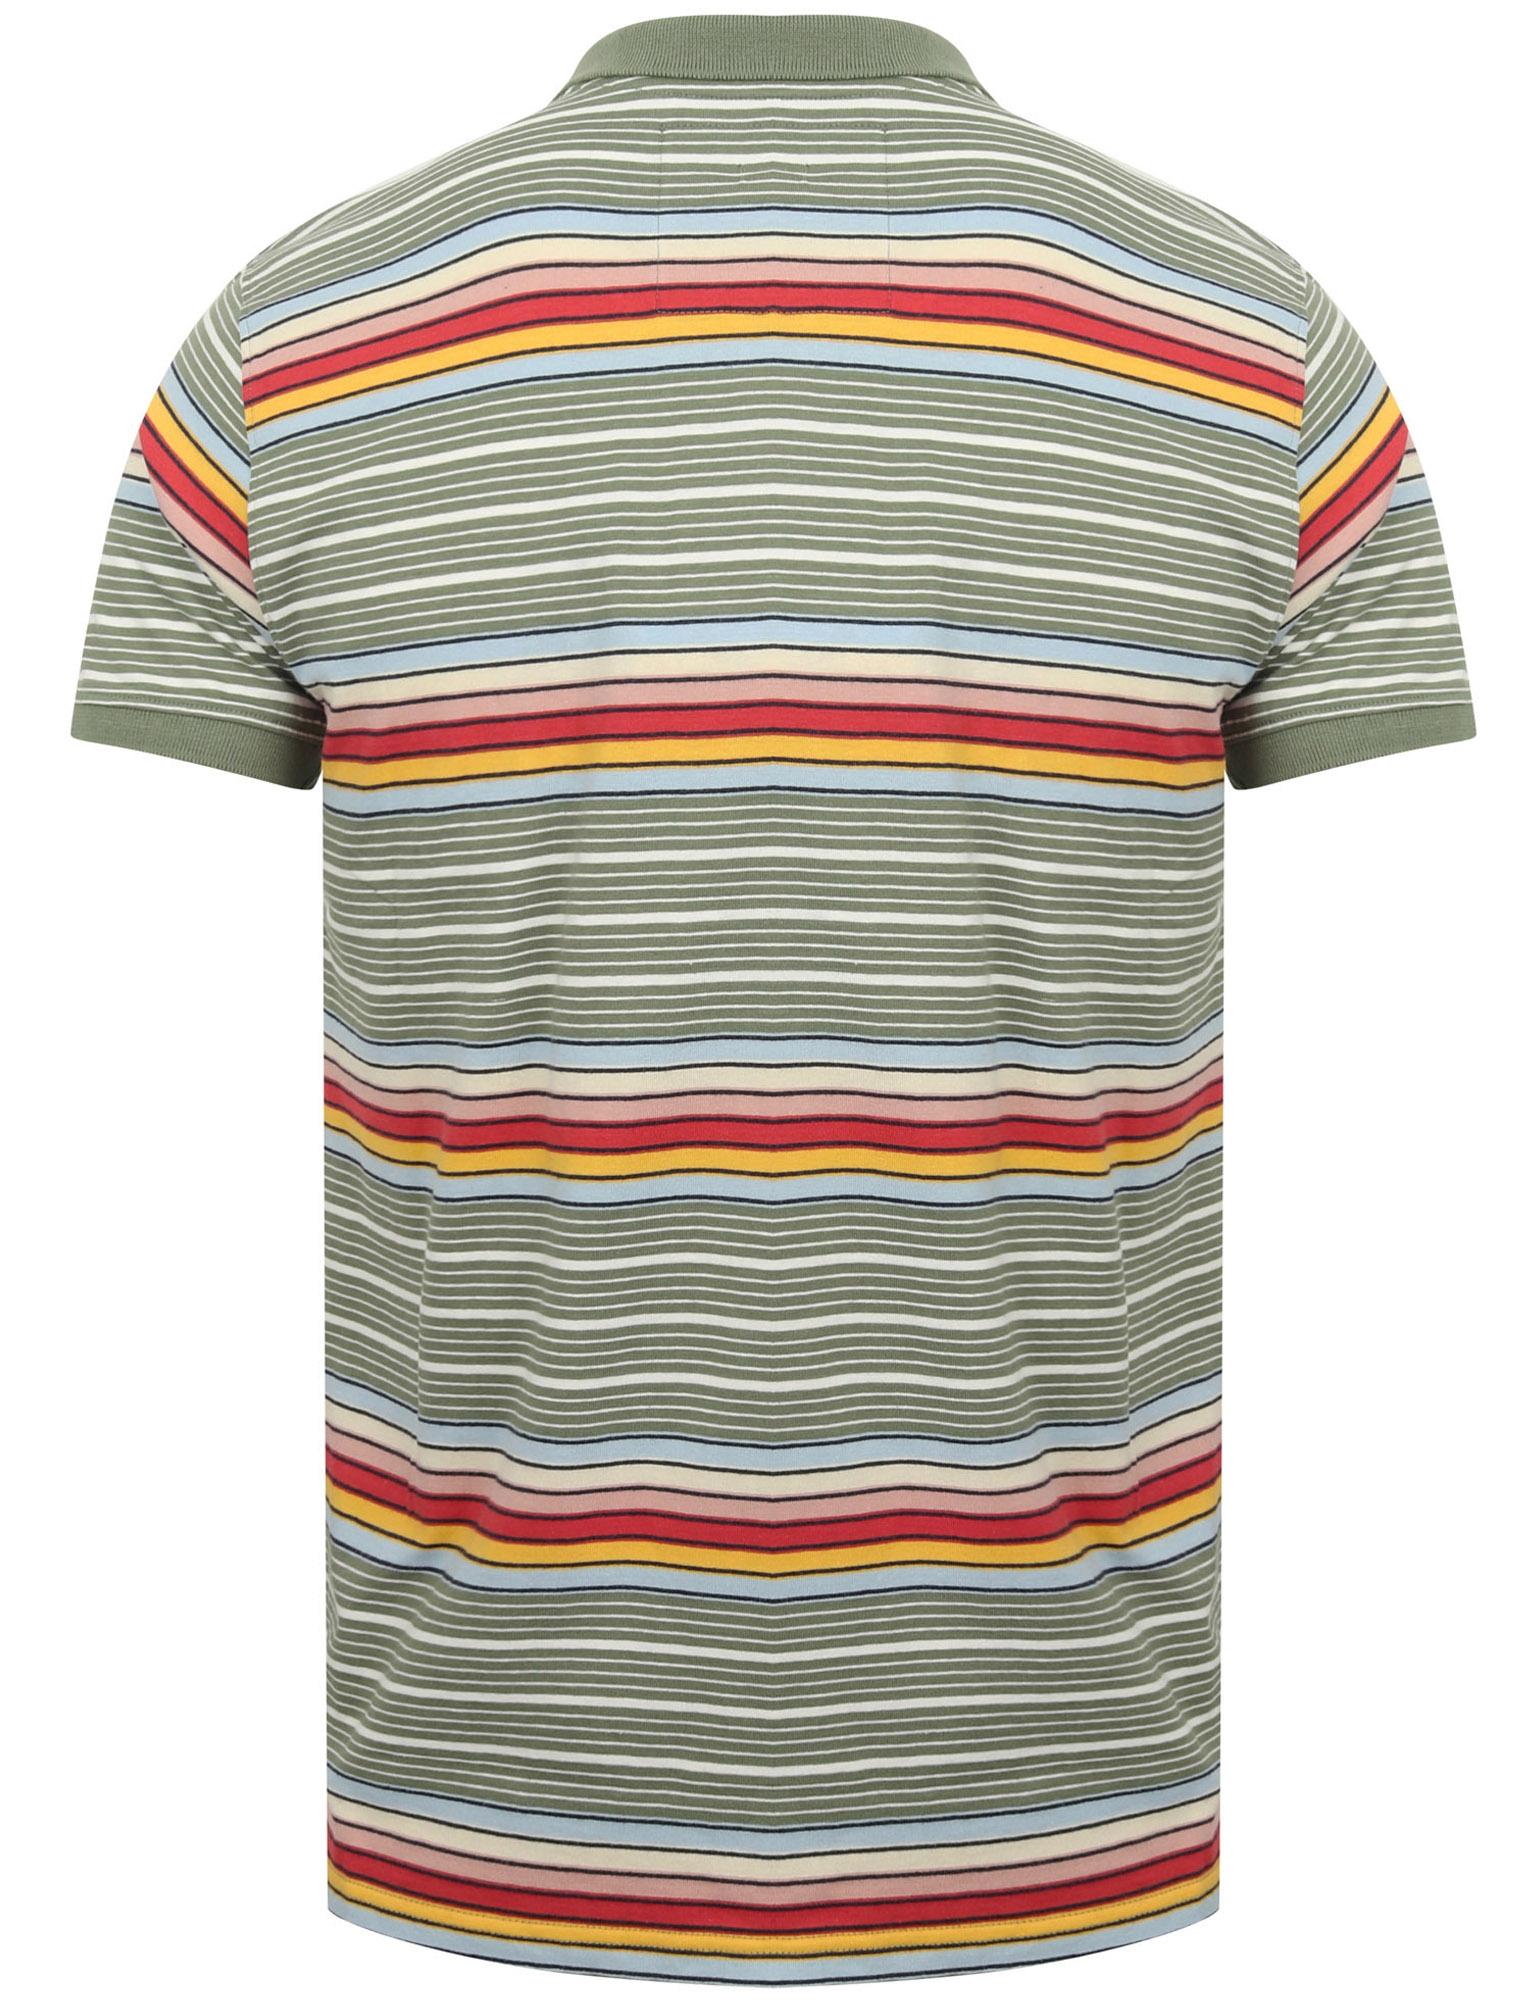 Tokyo-Laundry-Men-039-s-Bakersfield-Striped-Polo-Shirt-Stripy-Retro-Vintage-T-Shirt thumbnail 9